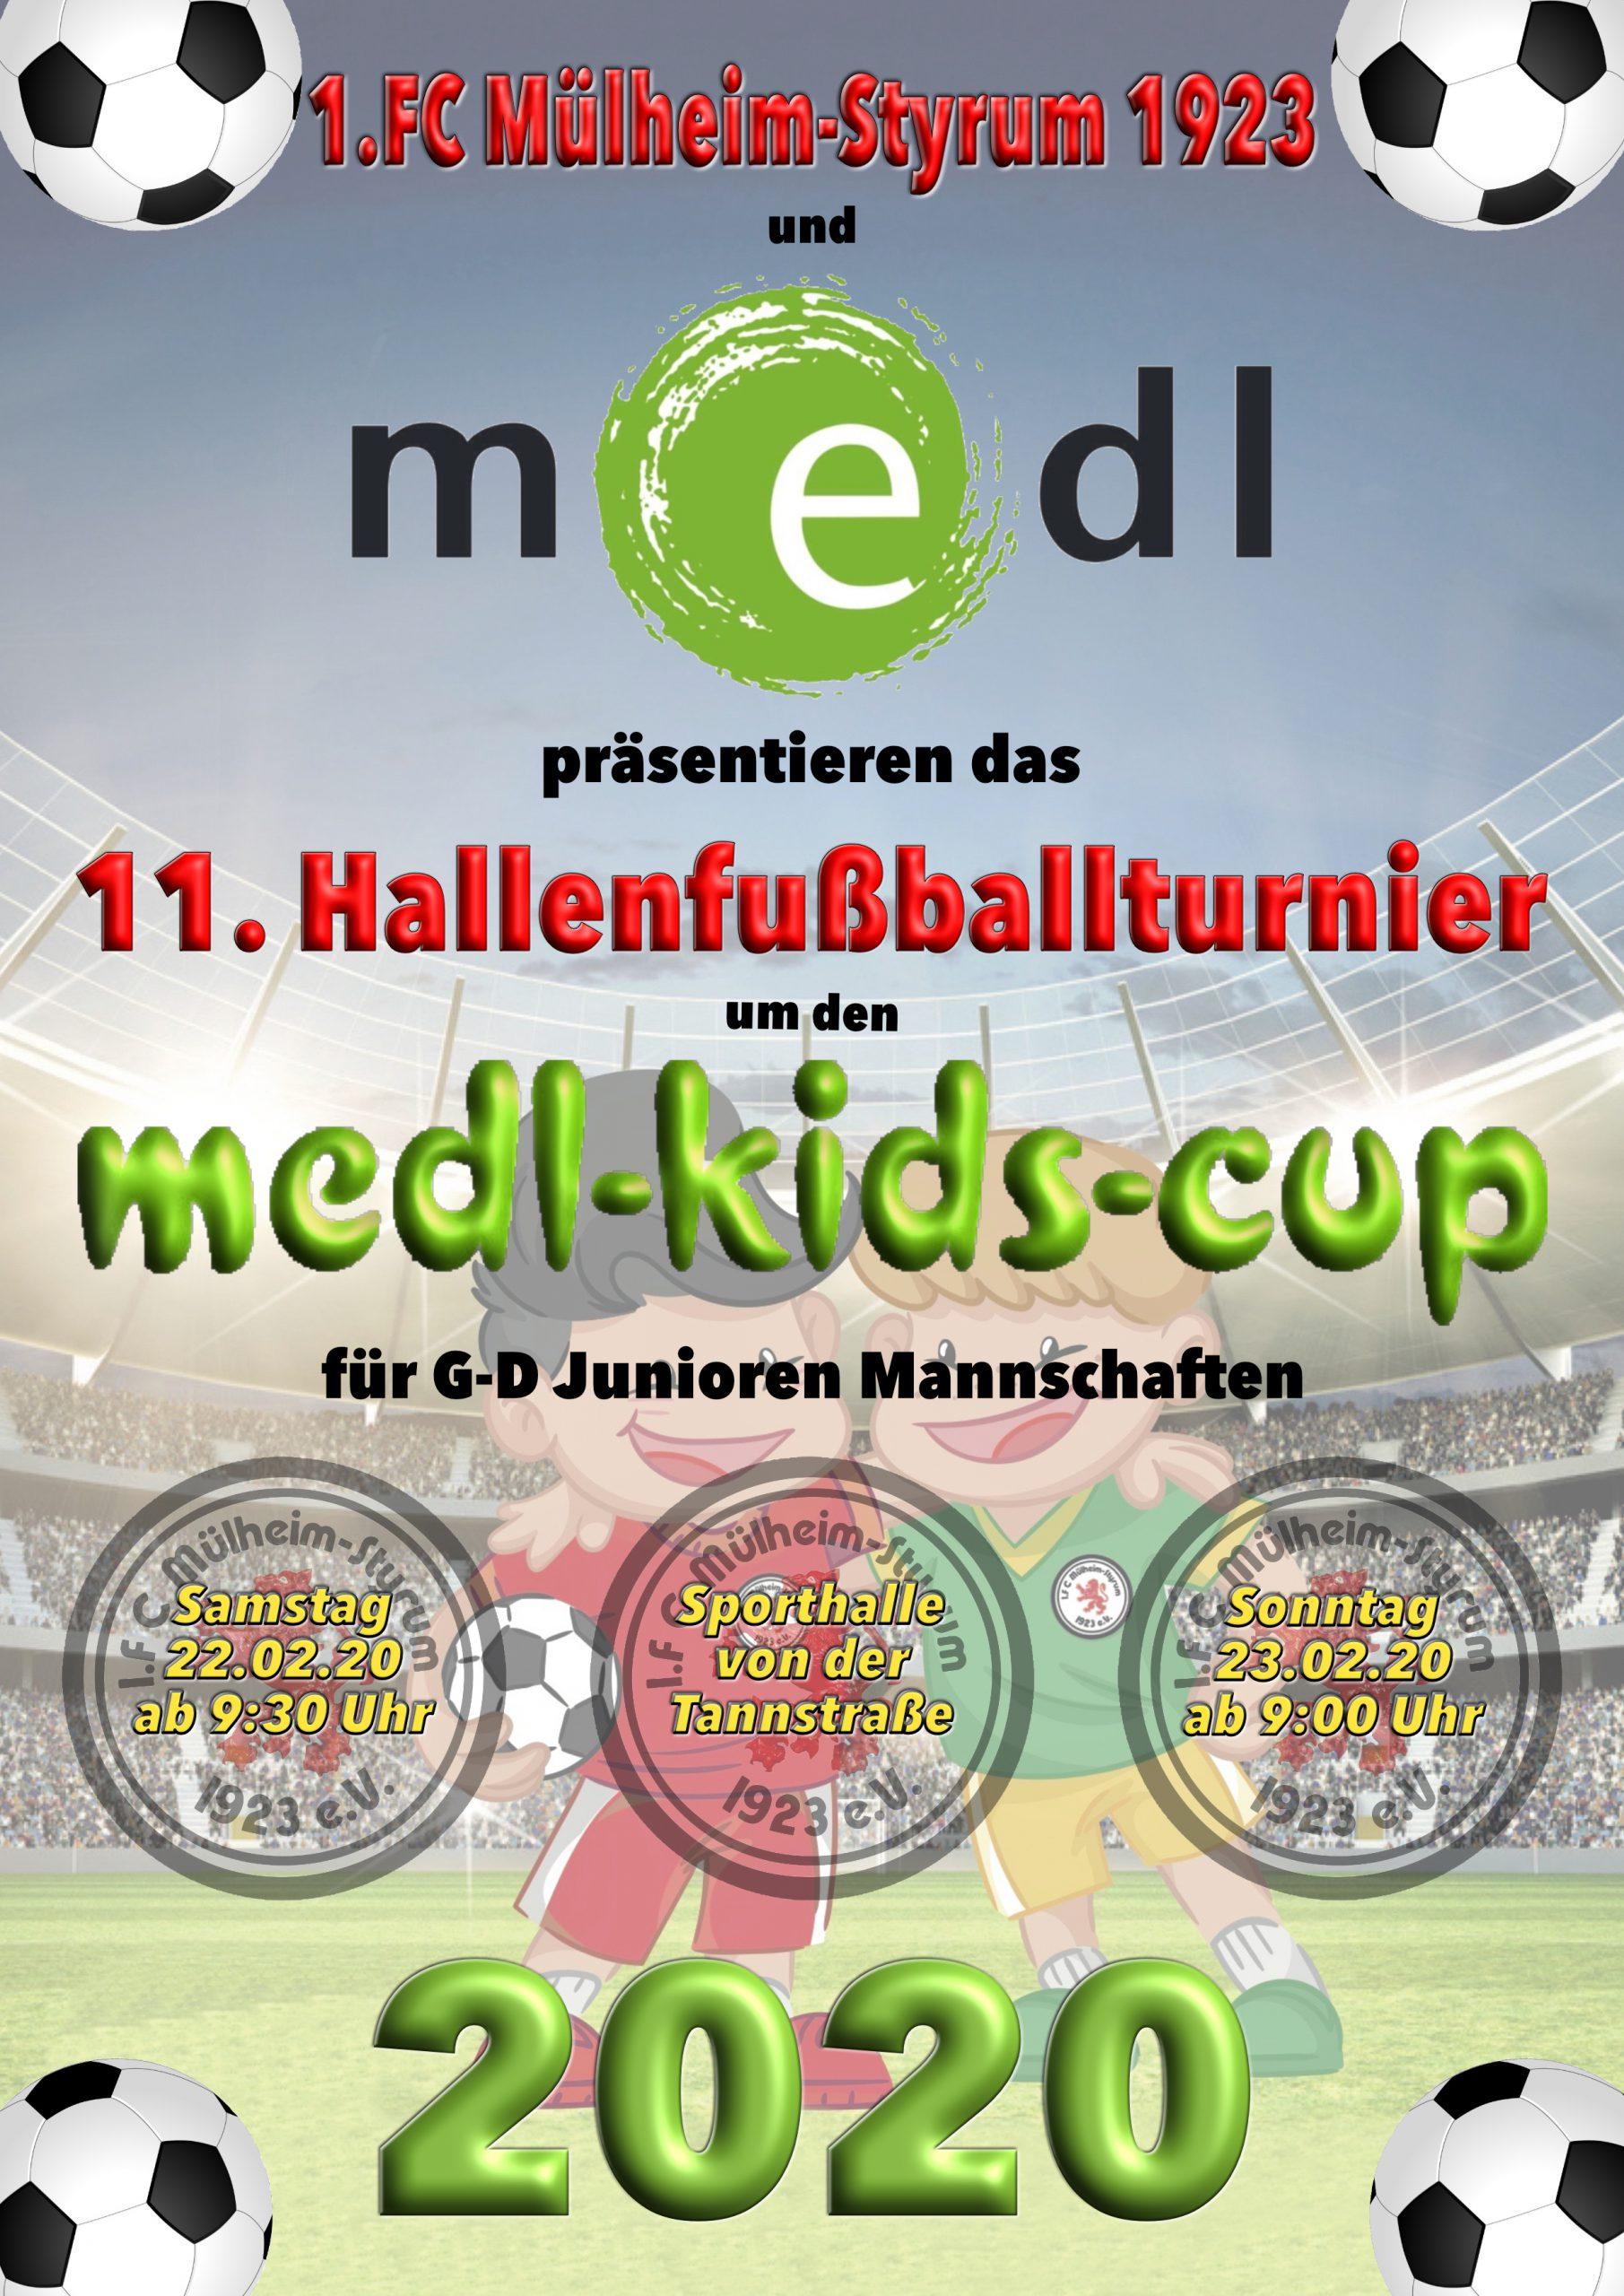 medl-kids-cup am Karneval-Wochenende